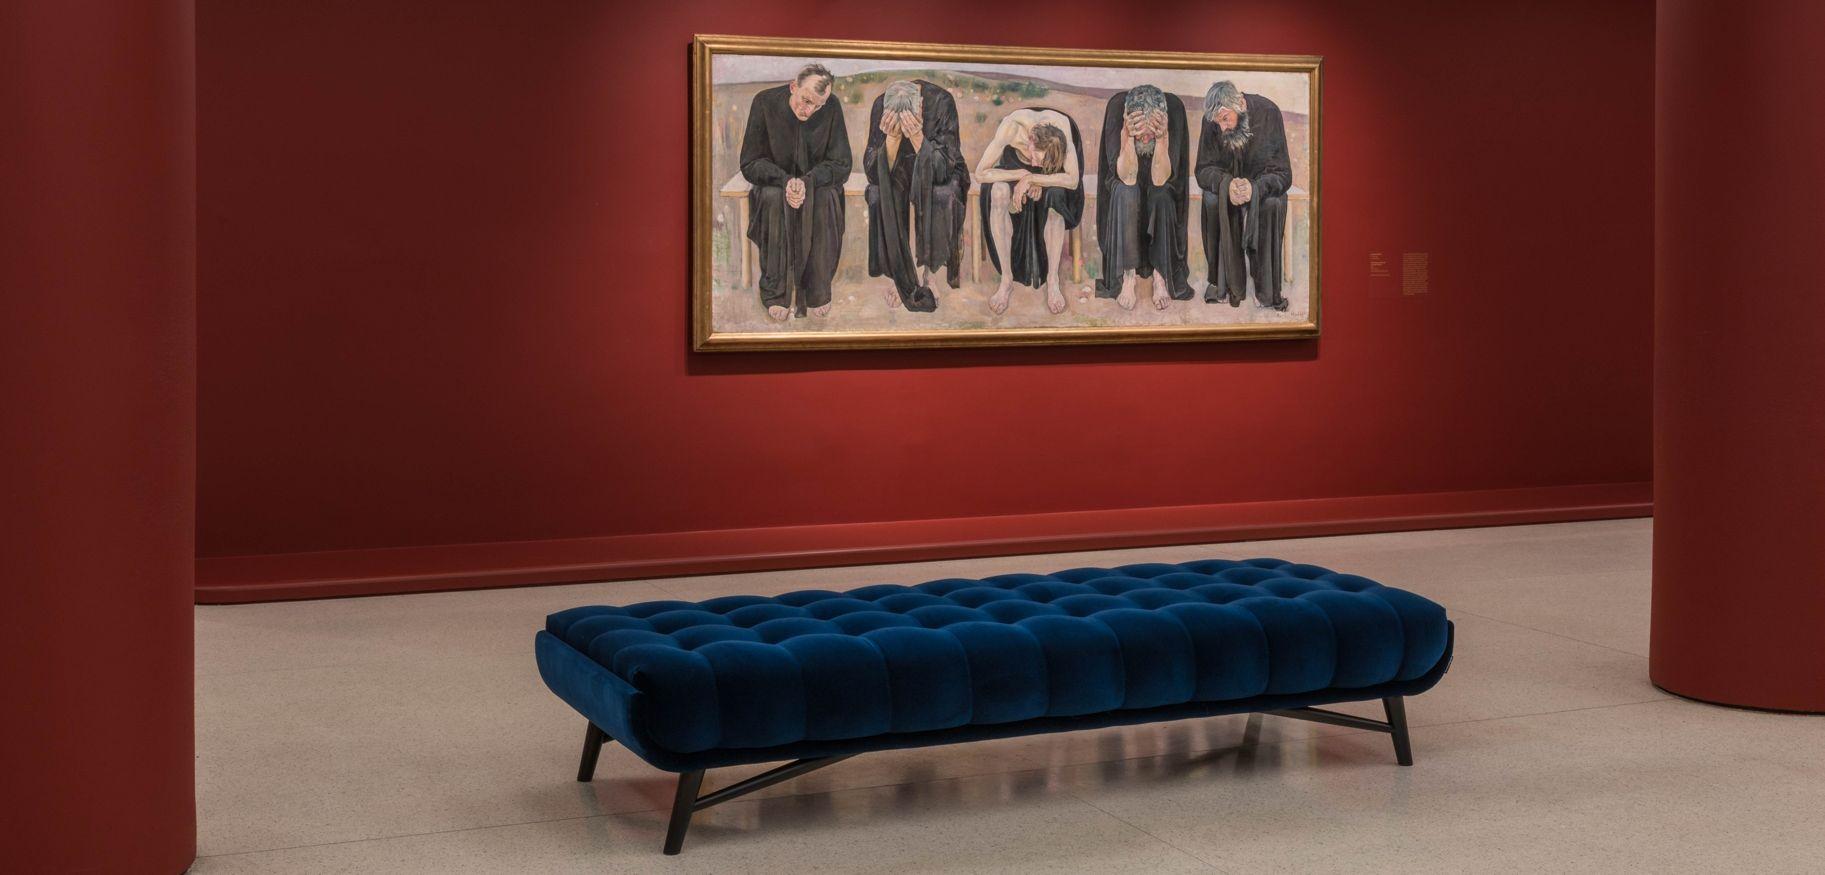 mystical symbolism exhibition roche bobois. Black Bedroom Furniture Sets. Home Design Ideas